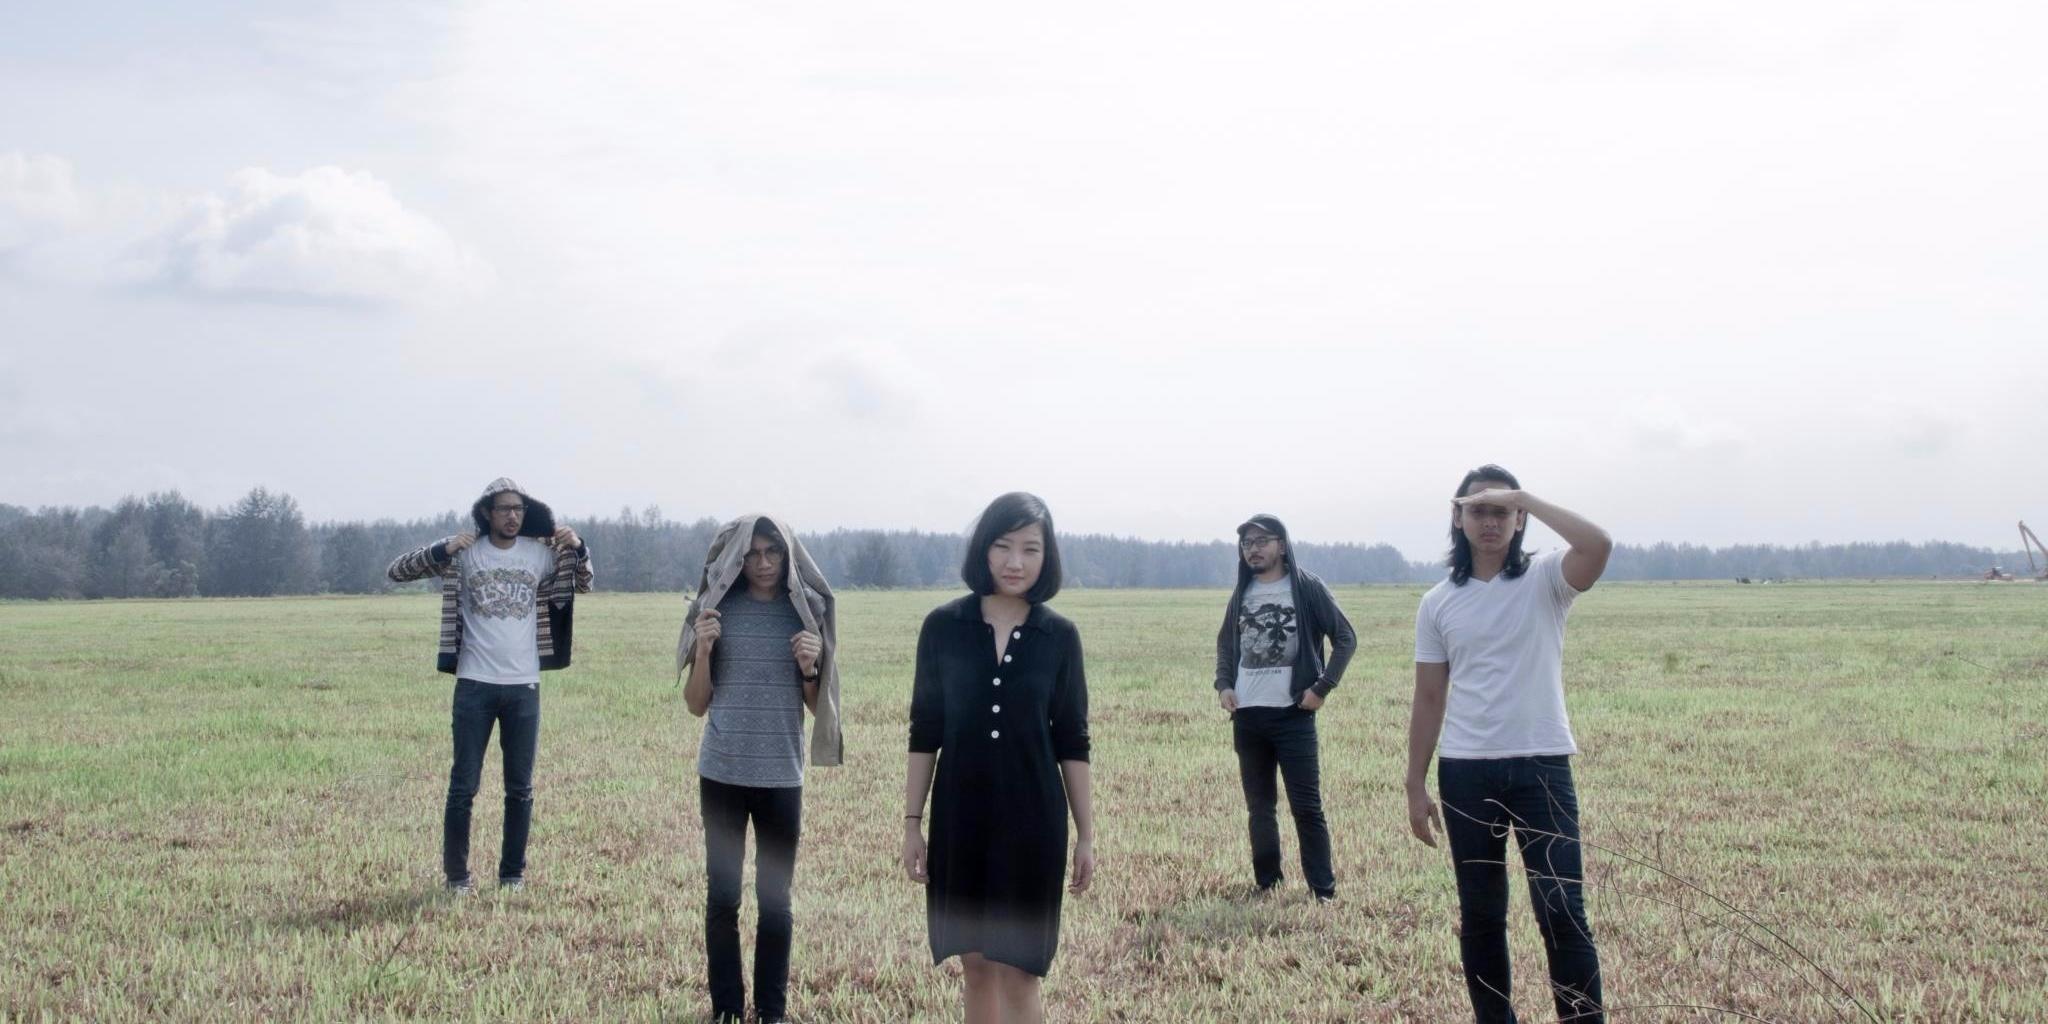 sub:shaman launches Apnea LP at Esplanade Annexe Studio with an intriguing audio-visual showcase